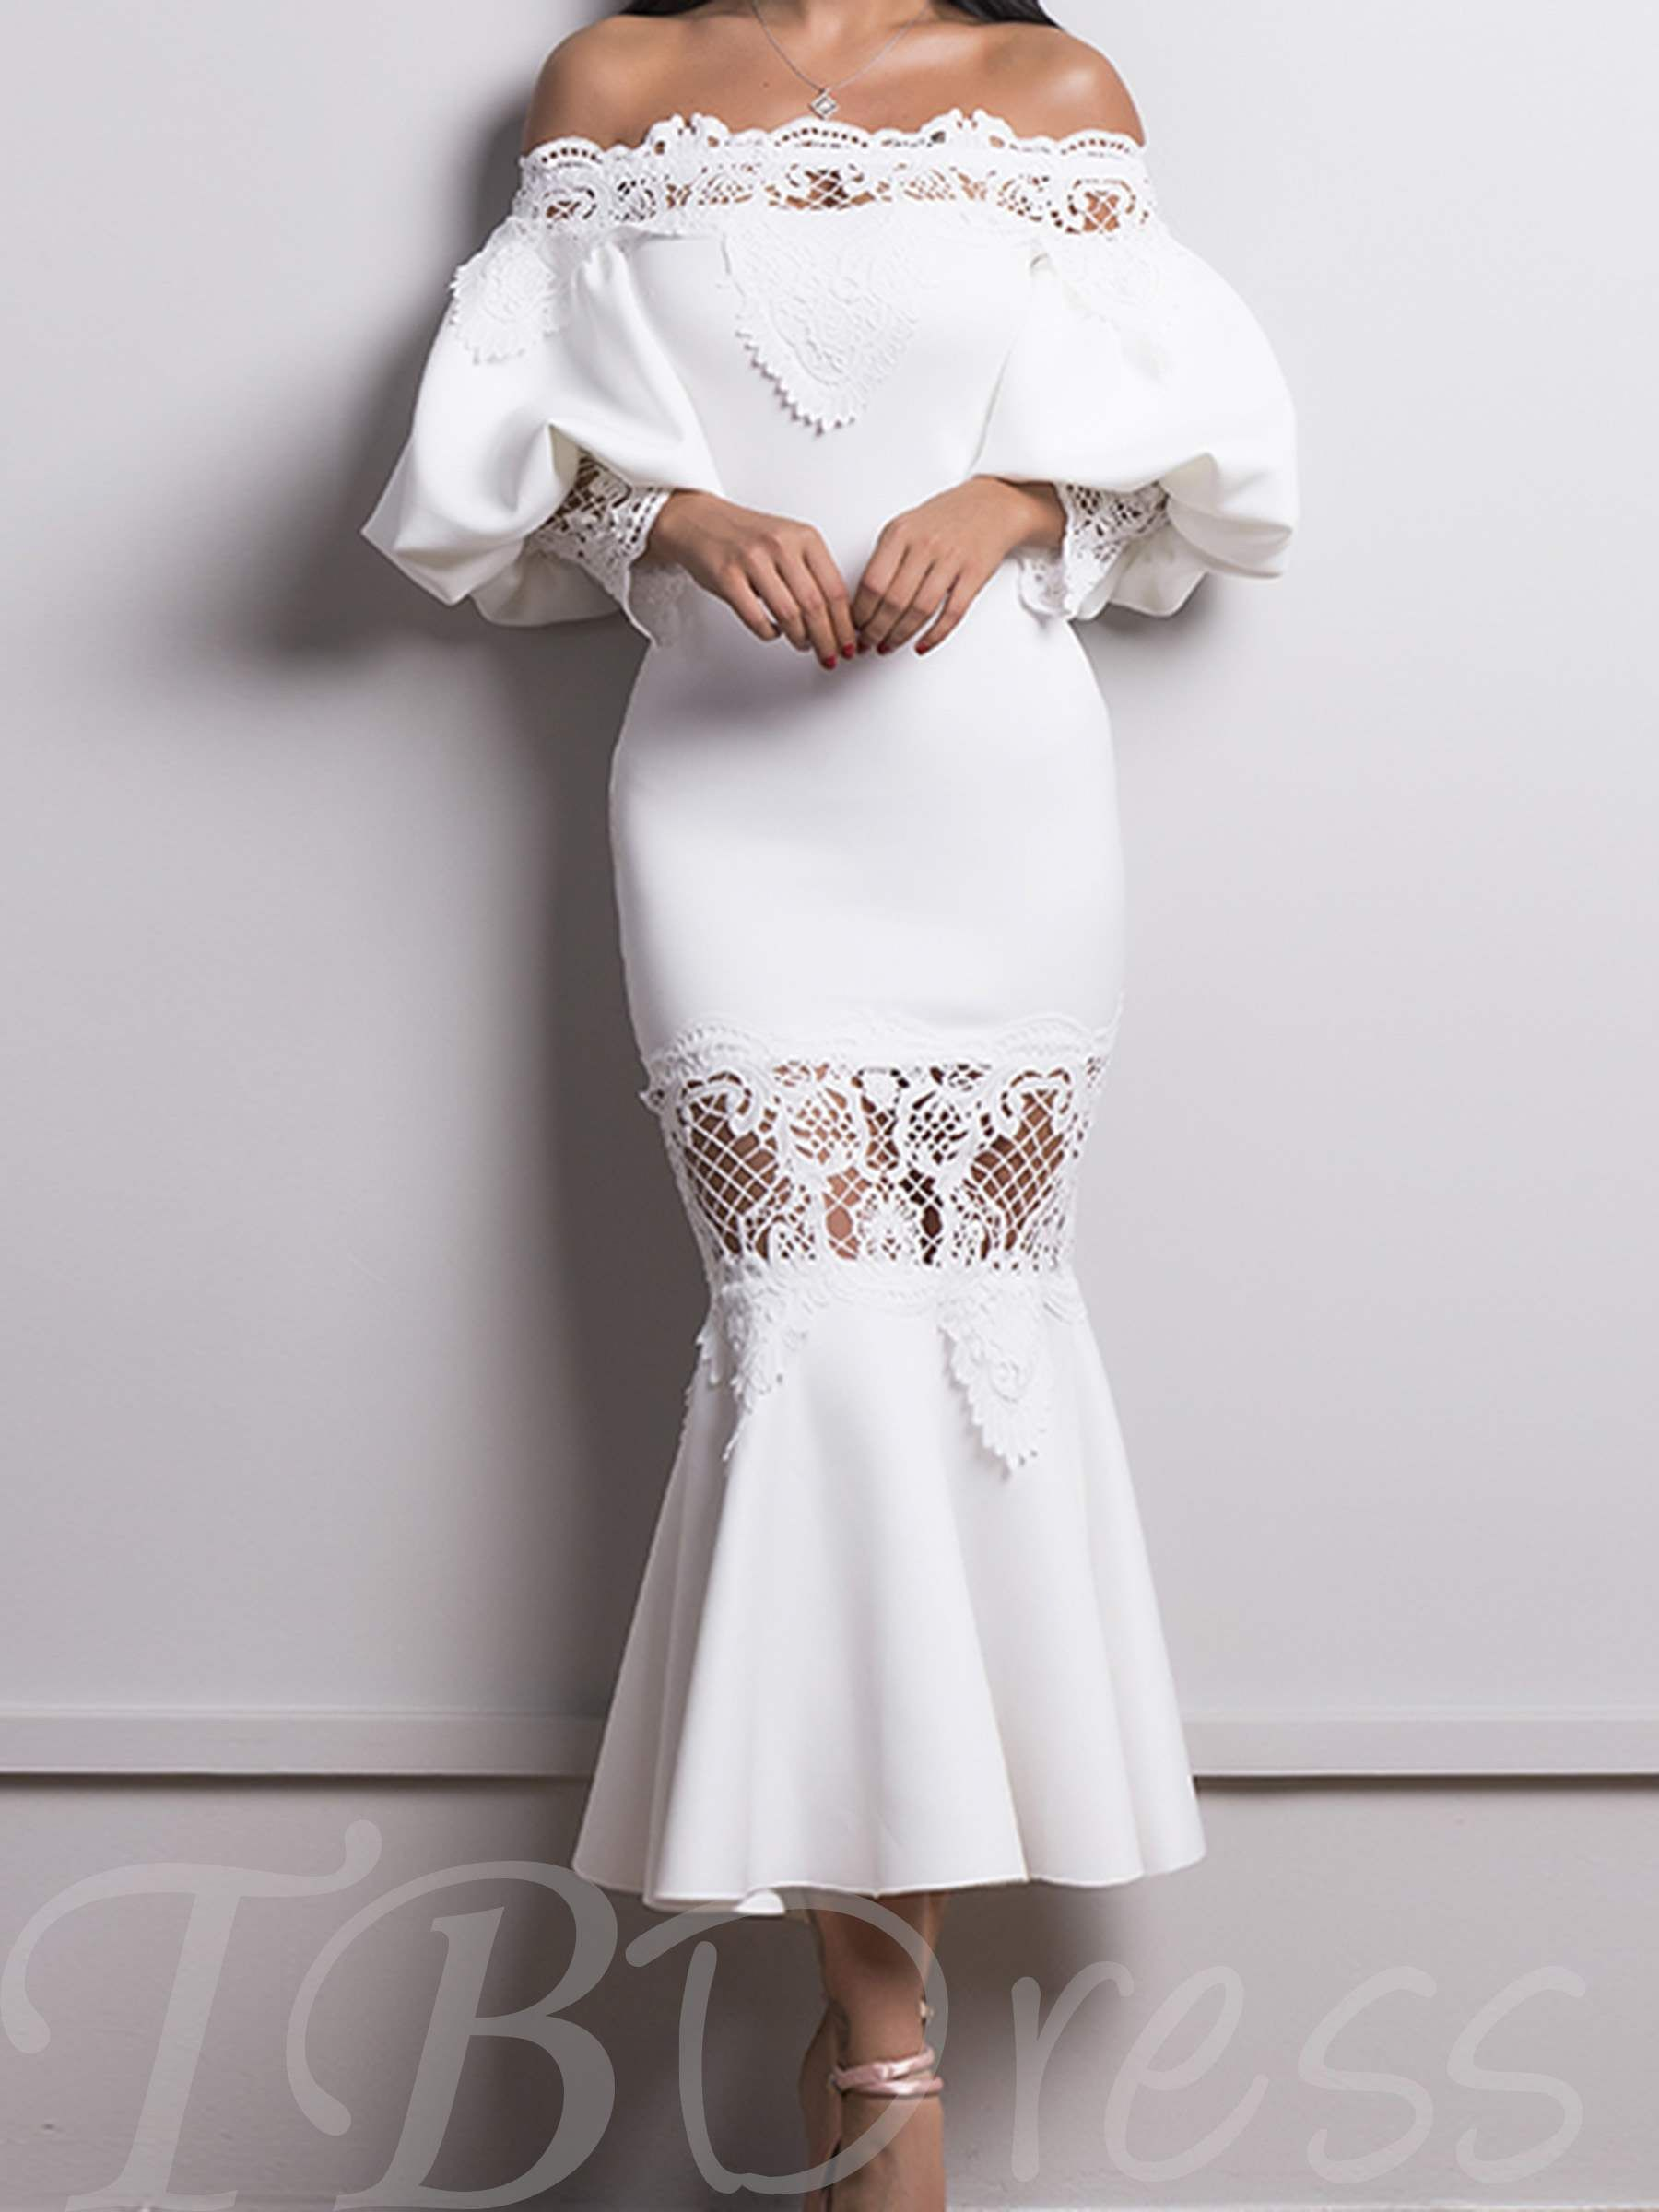 d3d4f4aa2d m.tbdress.com offers high quality White Mermaid Slash Neck Off Shoulder  Lace Dress under the category Maxi Dresses unit price of $ 28.21.